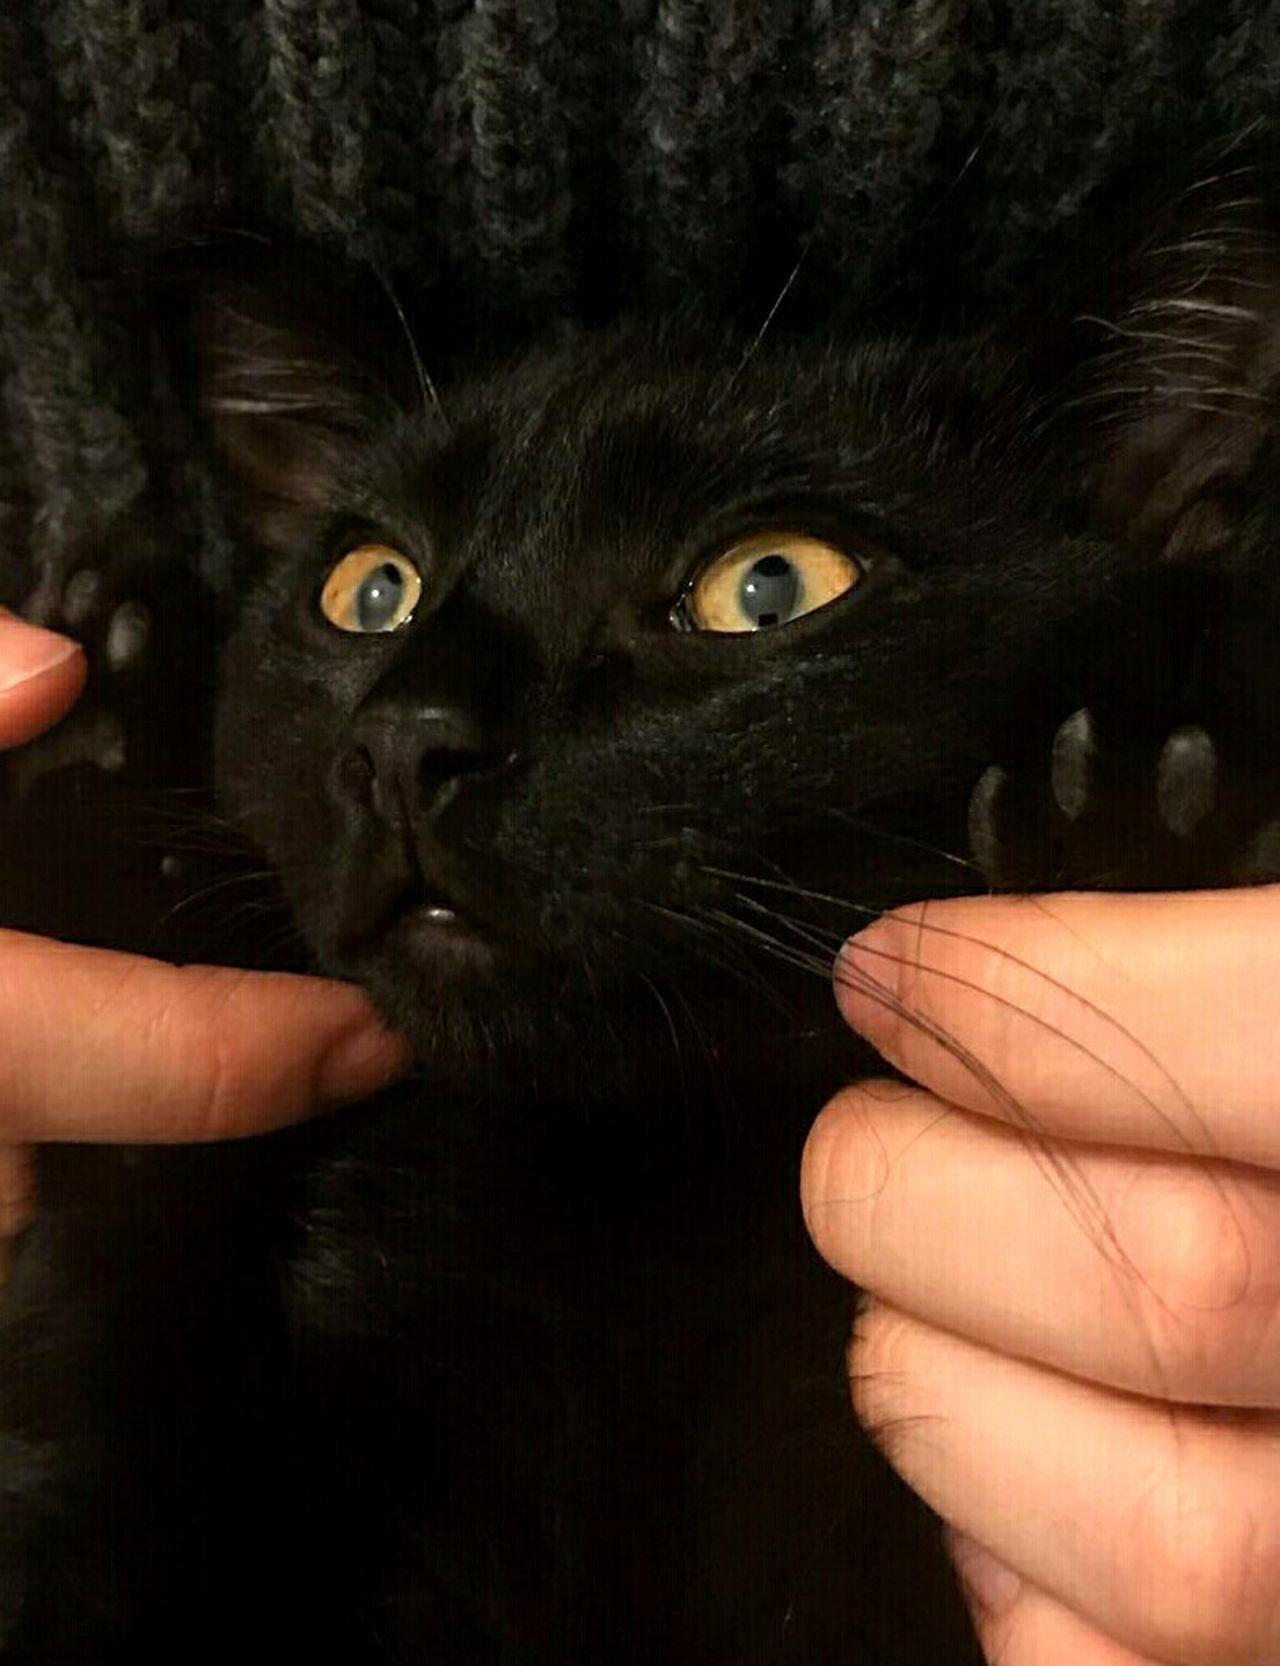 Circe 😻 Portrait Human Eye Animal Themes Mycat♥ BLackCat Circe Ya Tiene Casa CircetiAmo😻 Mycatisthebest MyCatismyLove Gatita  Love ♥